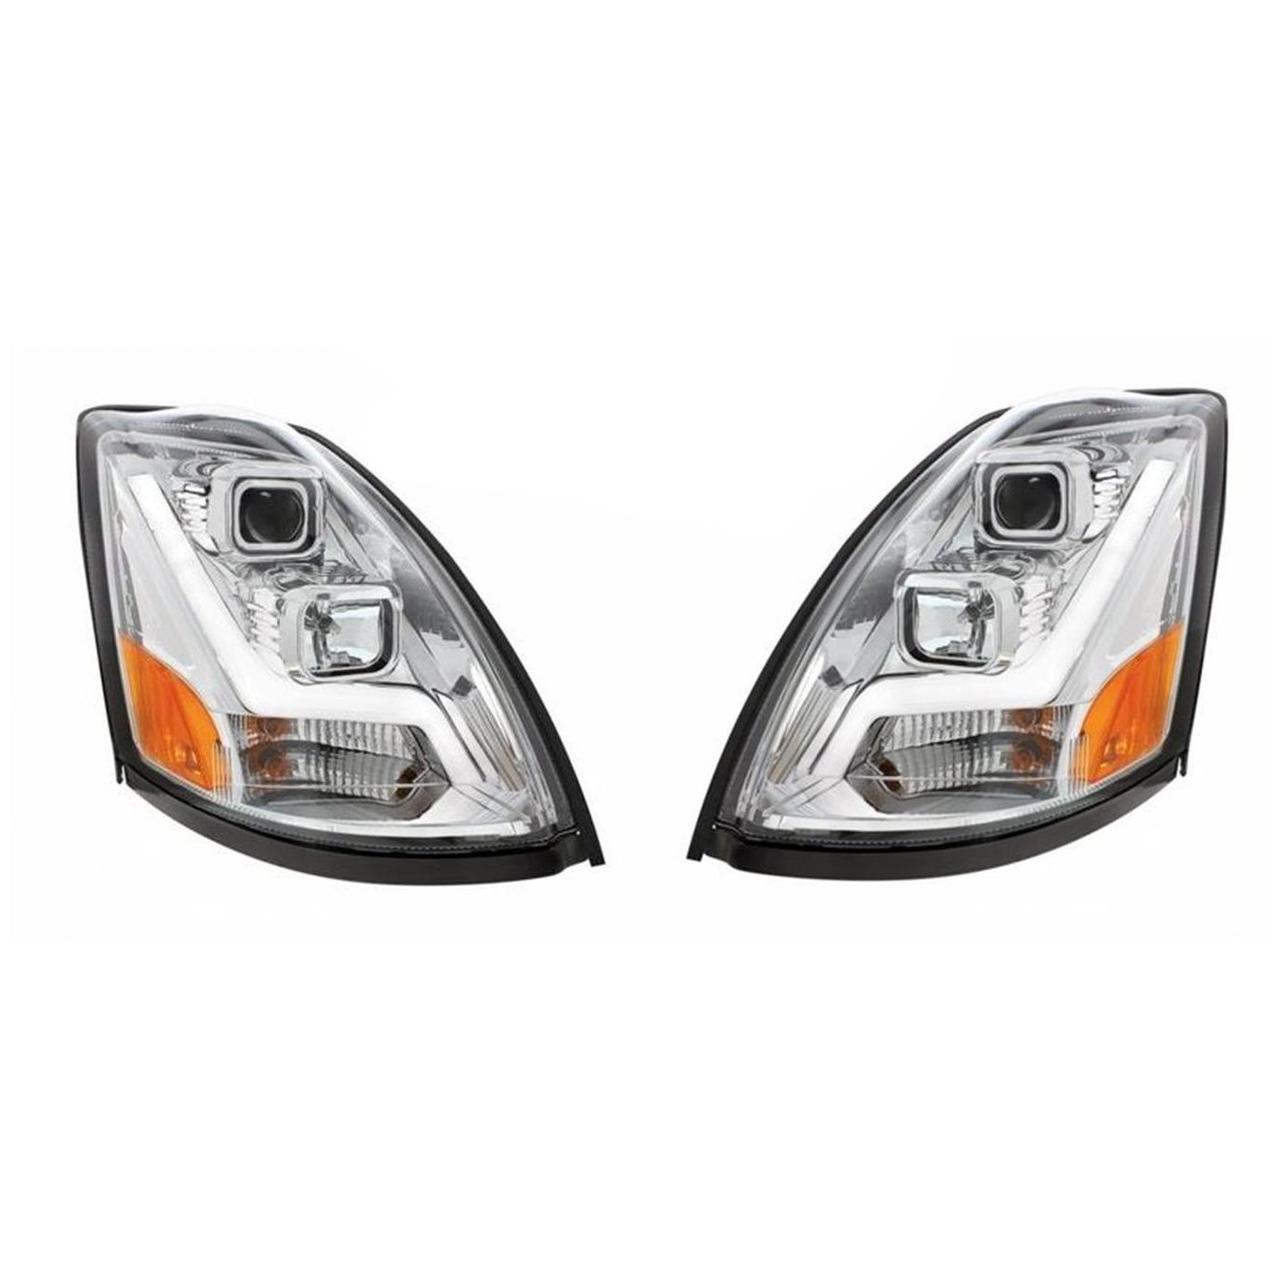 Volvo VN/VNL Projection Headlights with LED Position Light Bar, Chrome